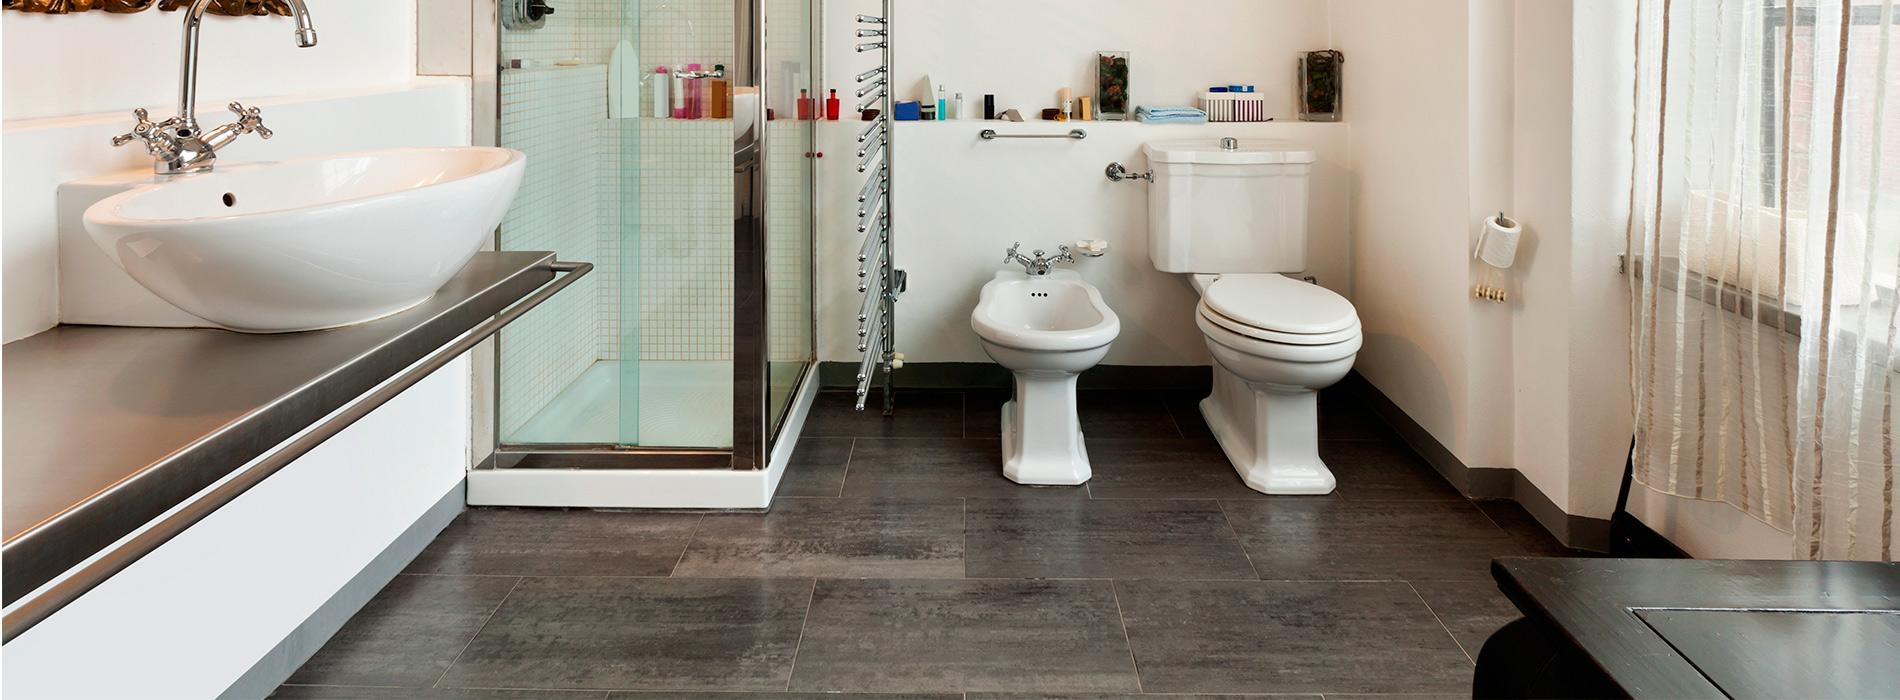 Inspirate para reformar tu baño